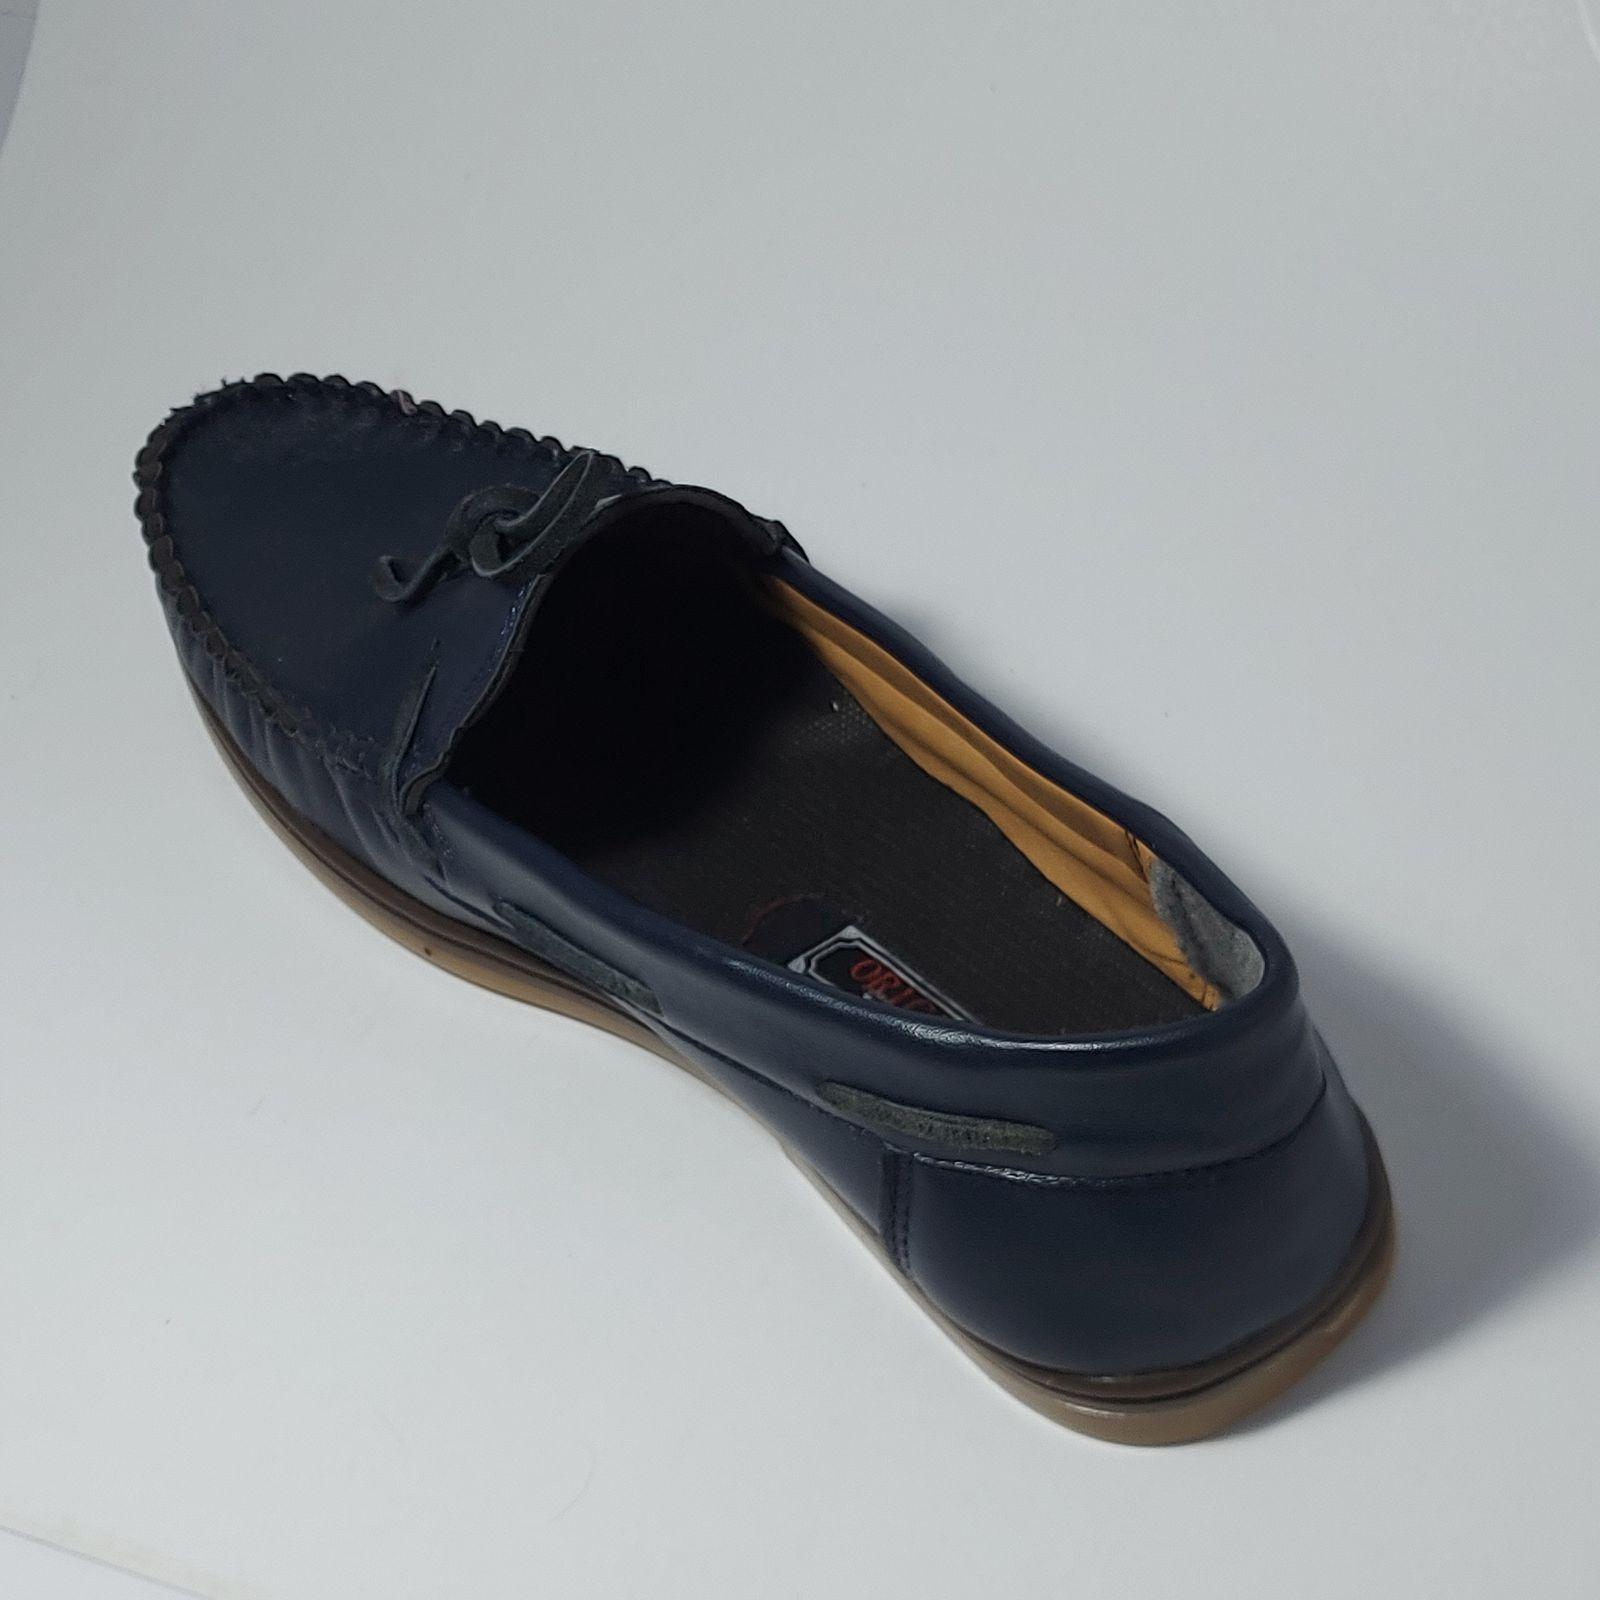 کفش روزمره مردانه مدل CH001 -  - 5